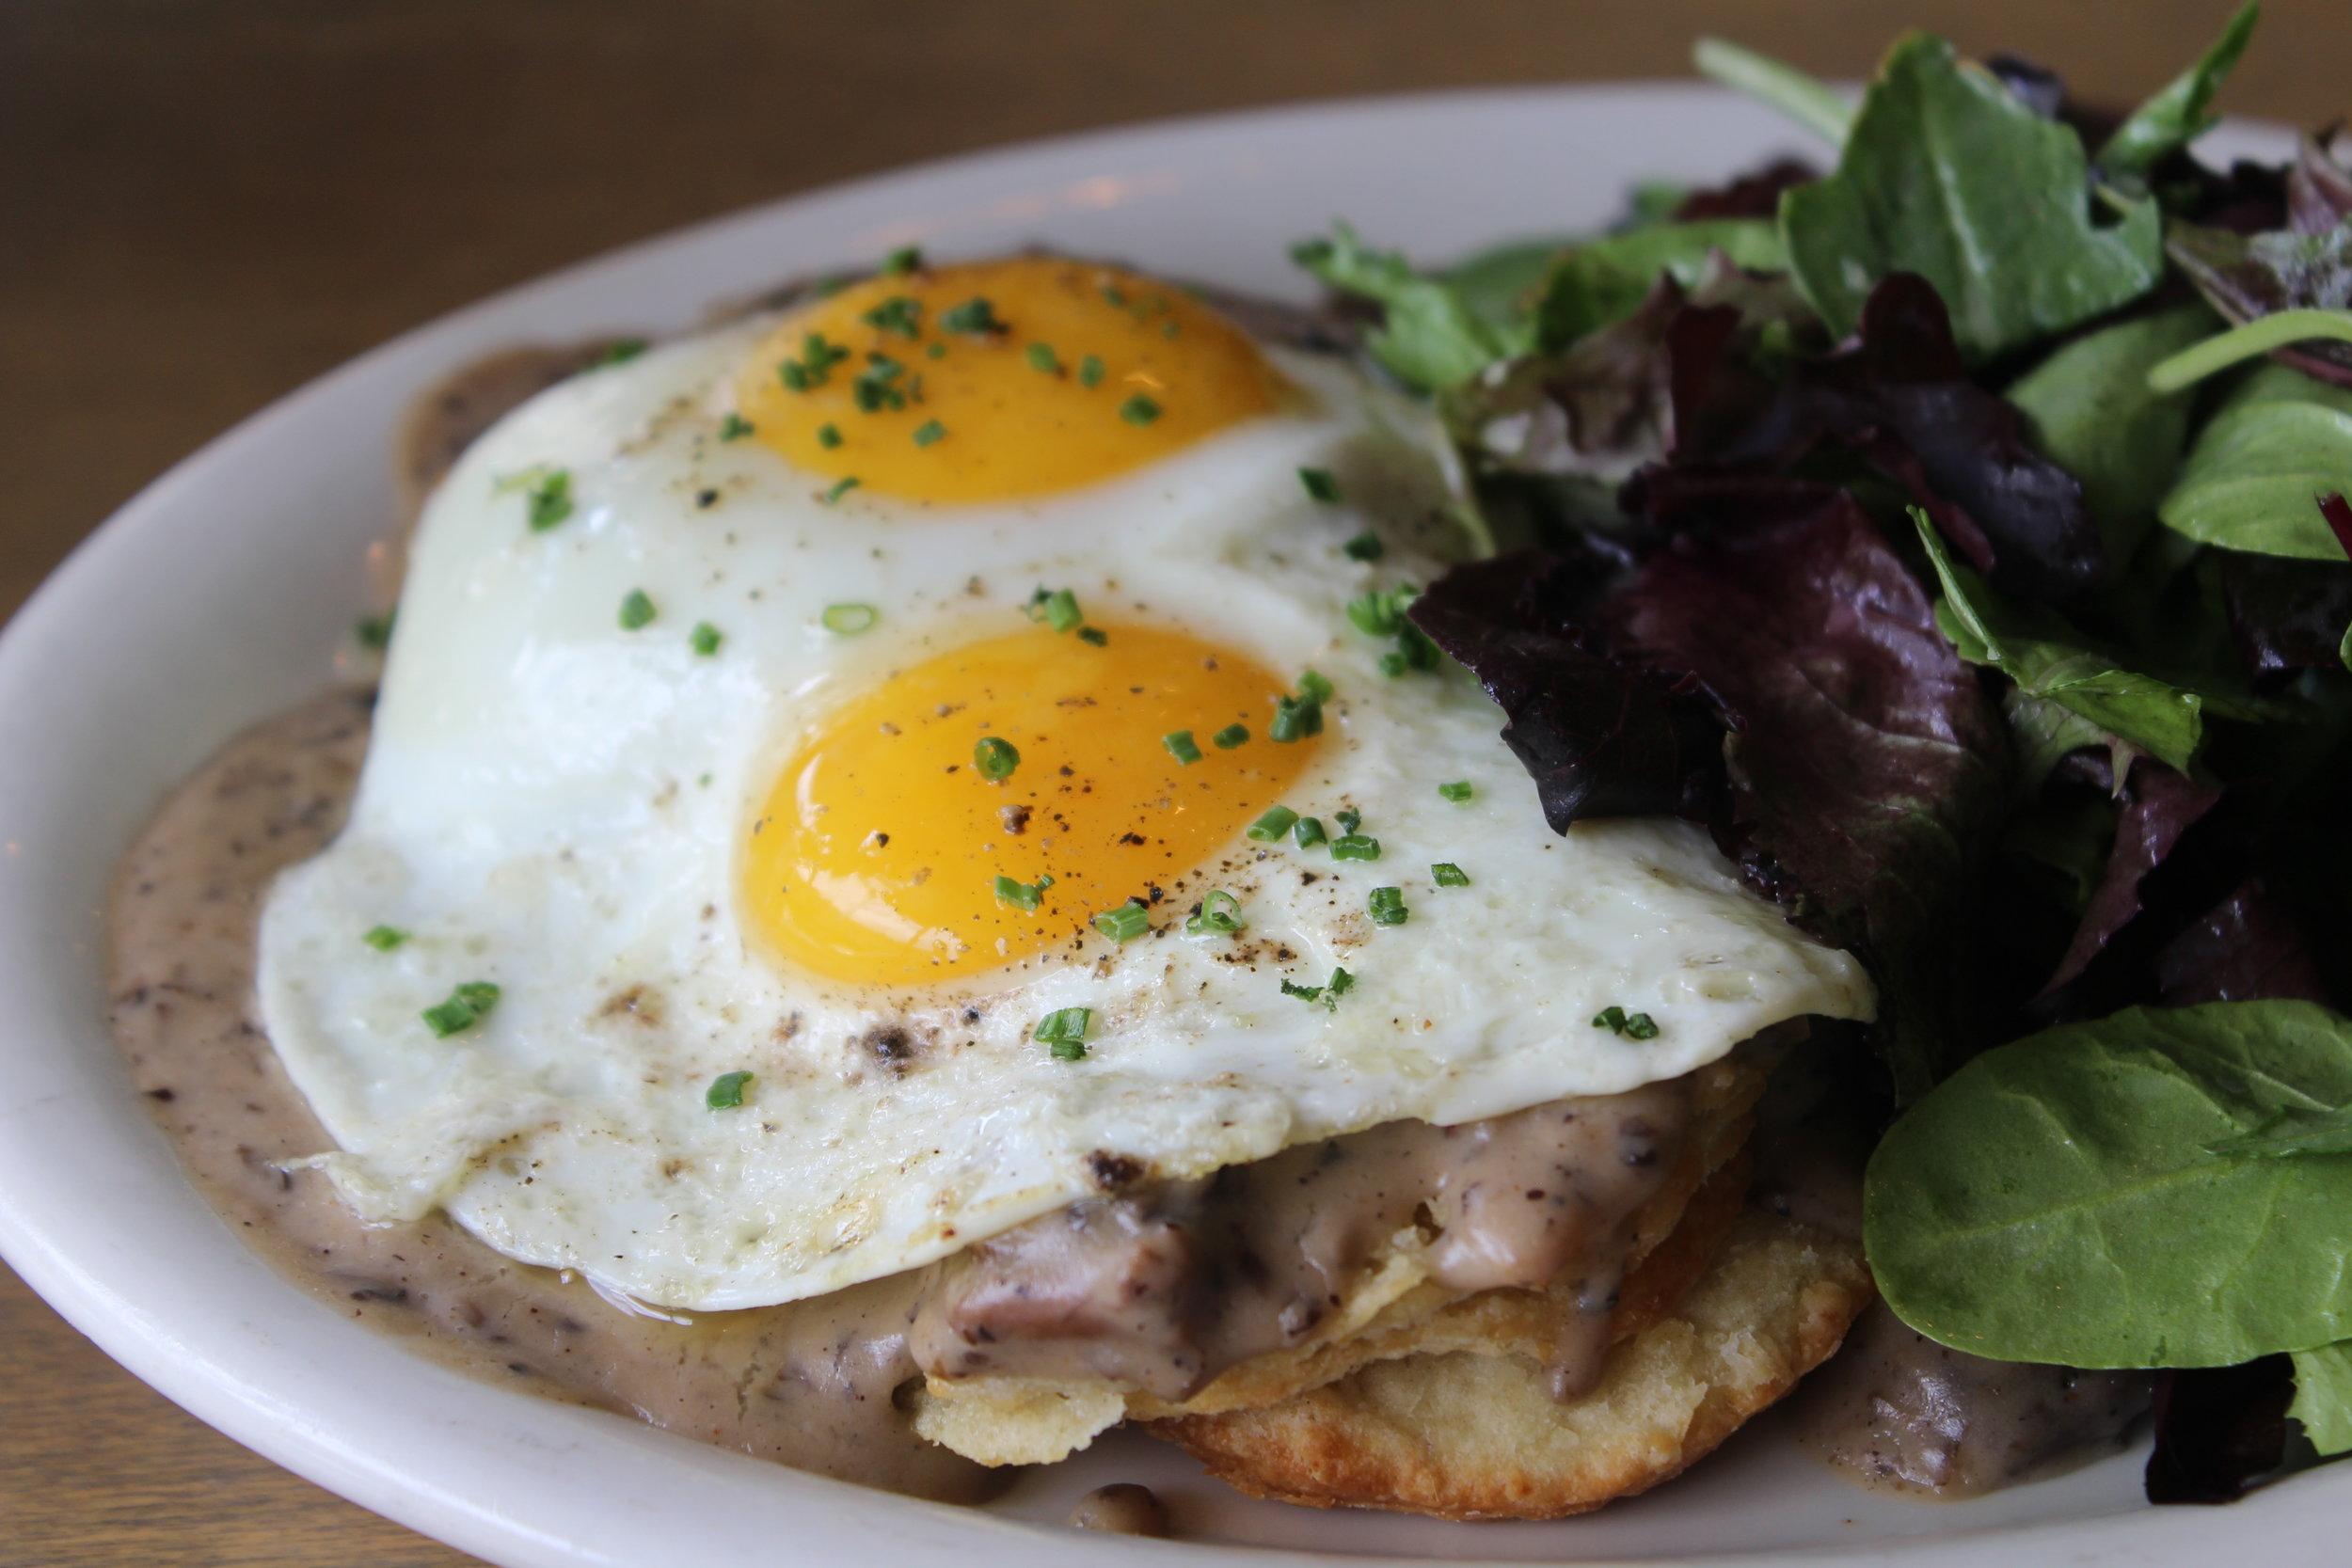 Biscuits + Mushroom Gravy, Eggs